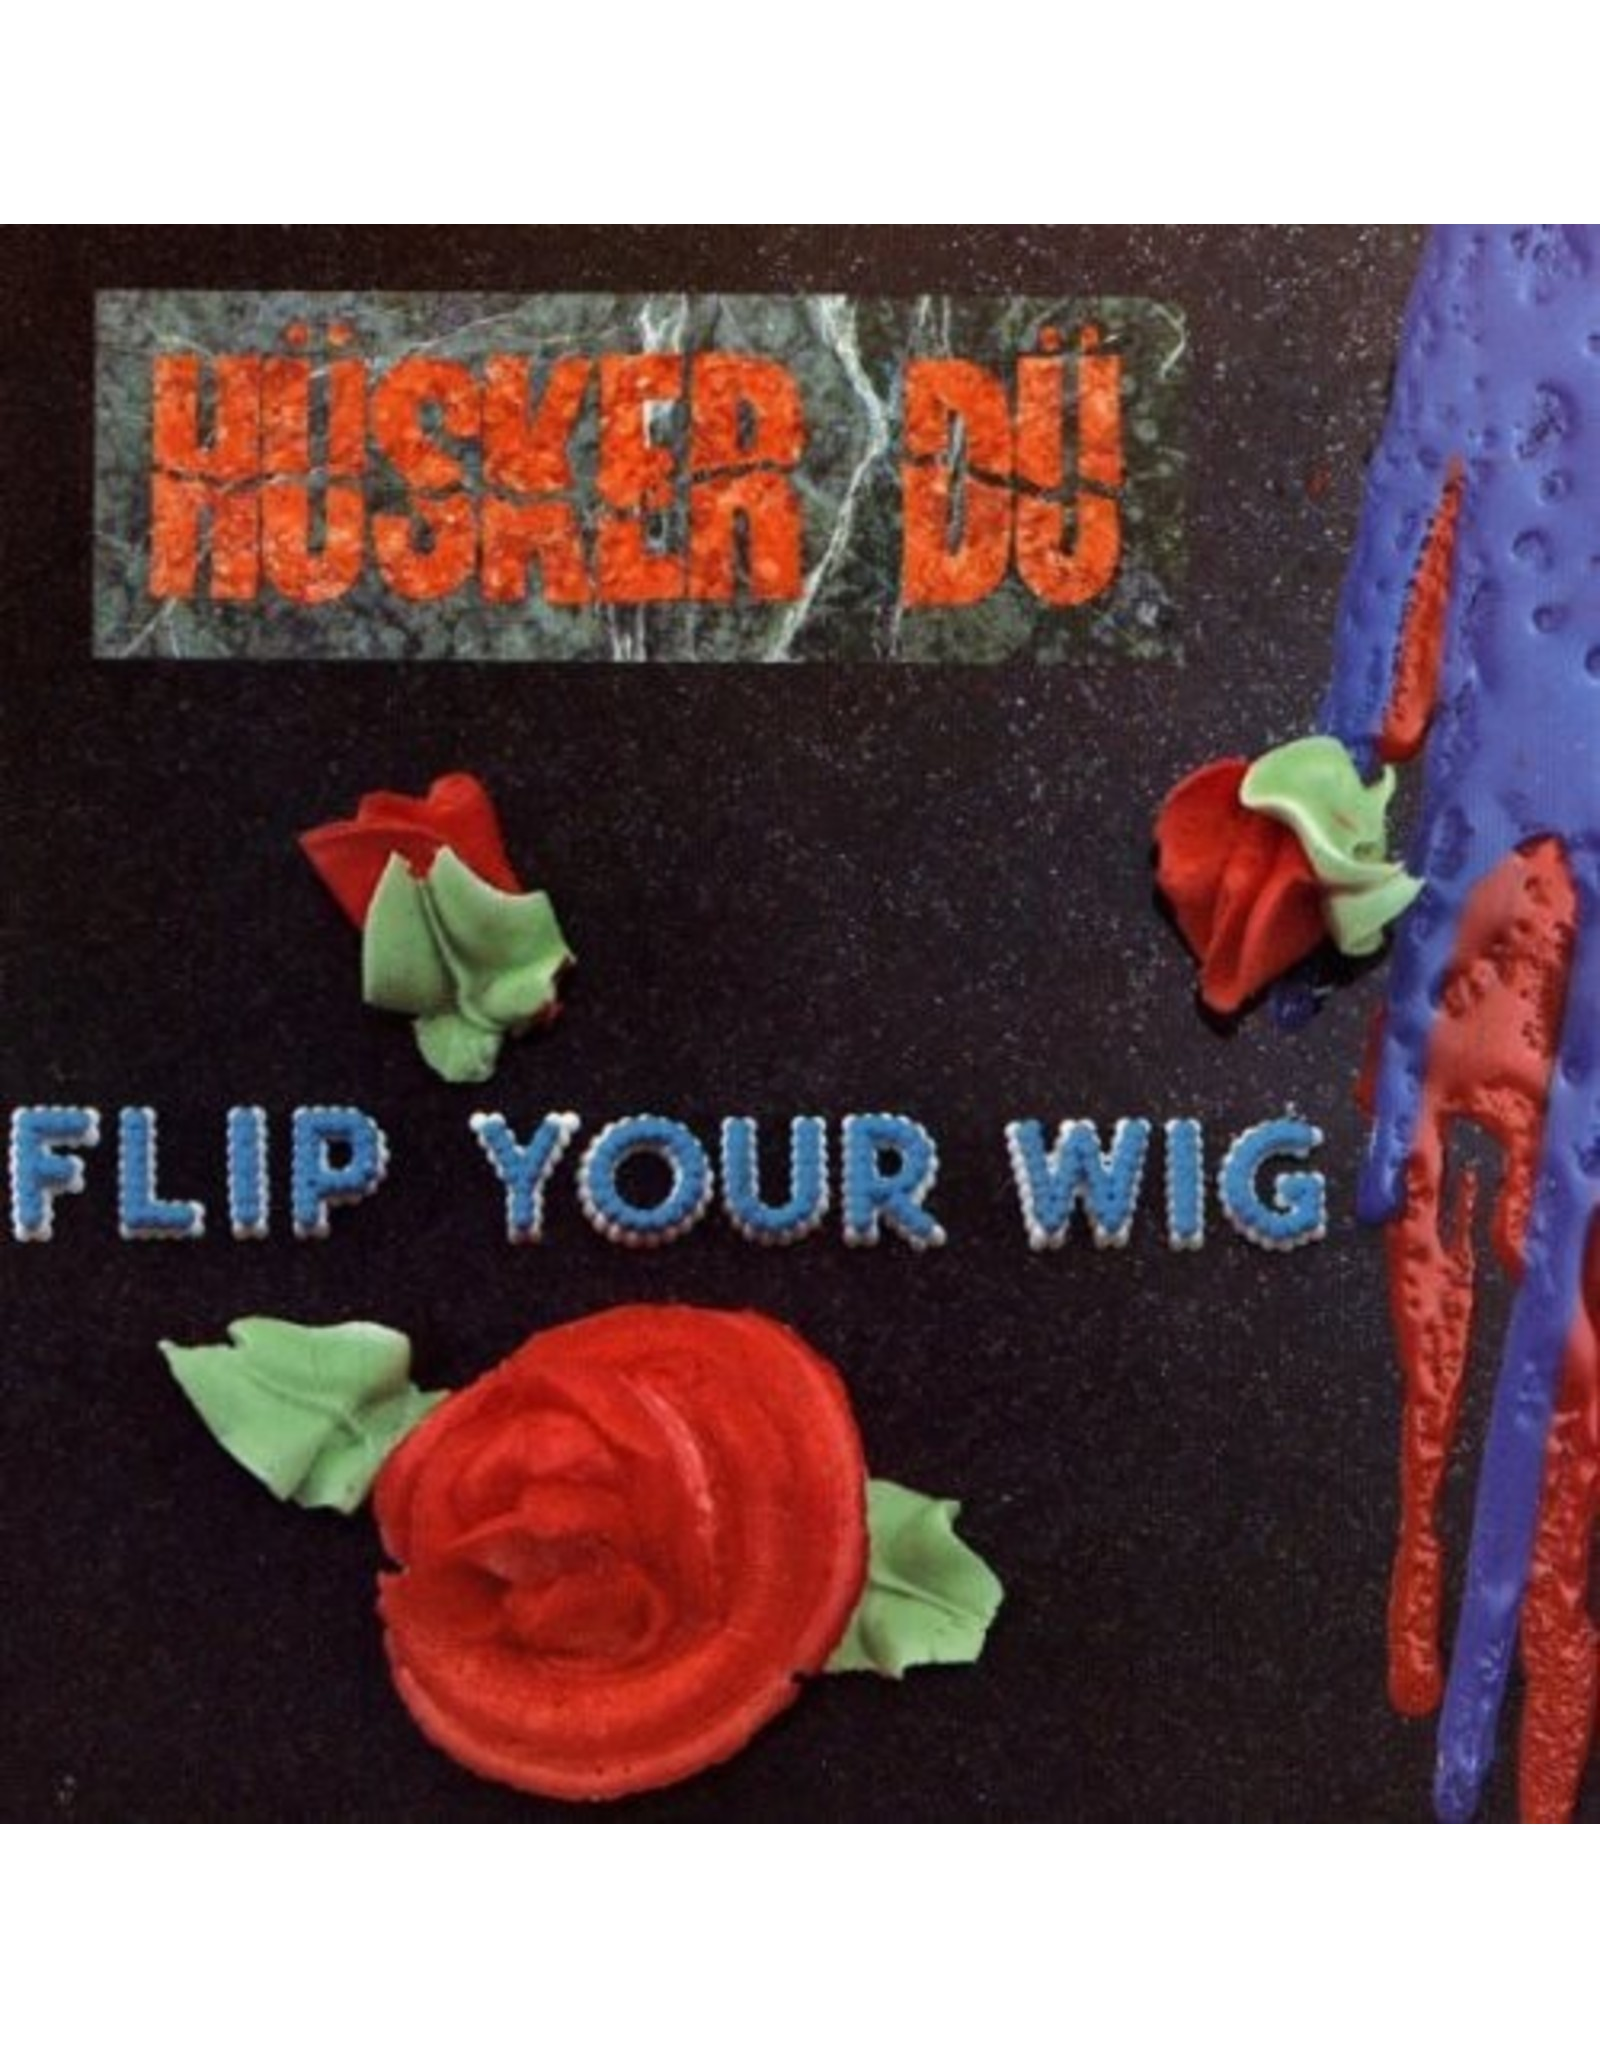 New Vinyl Husker Du - Flip Your Wig LP